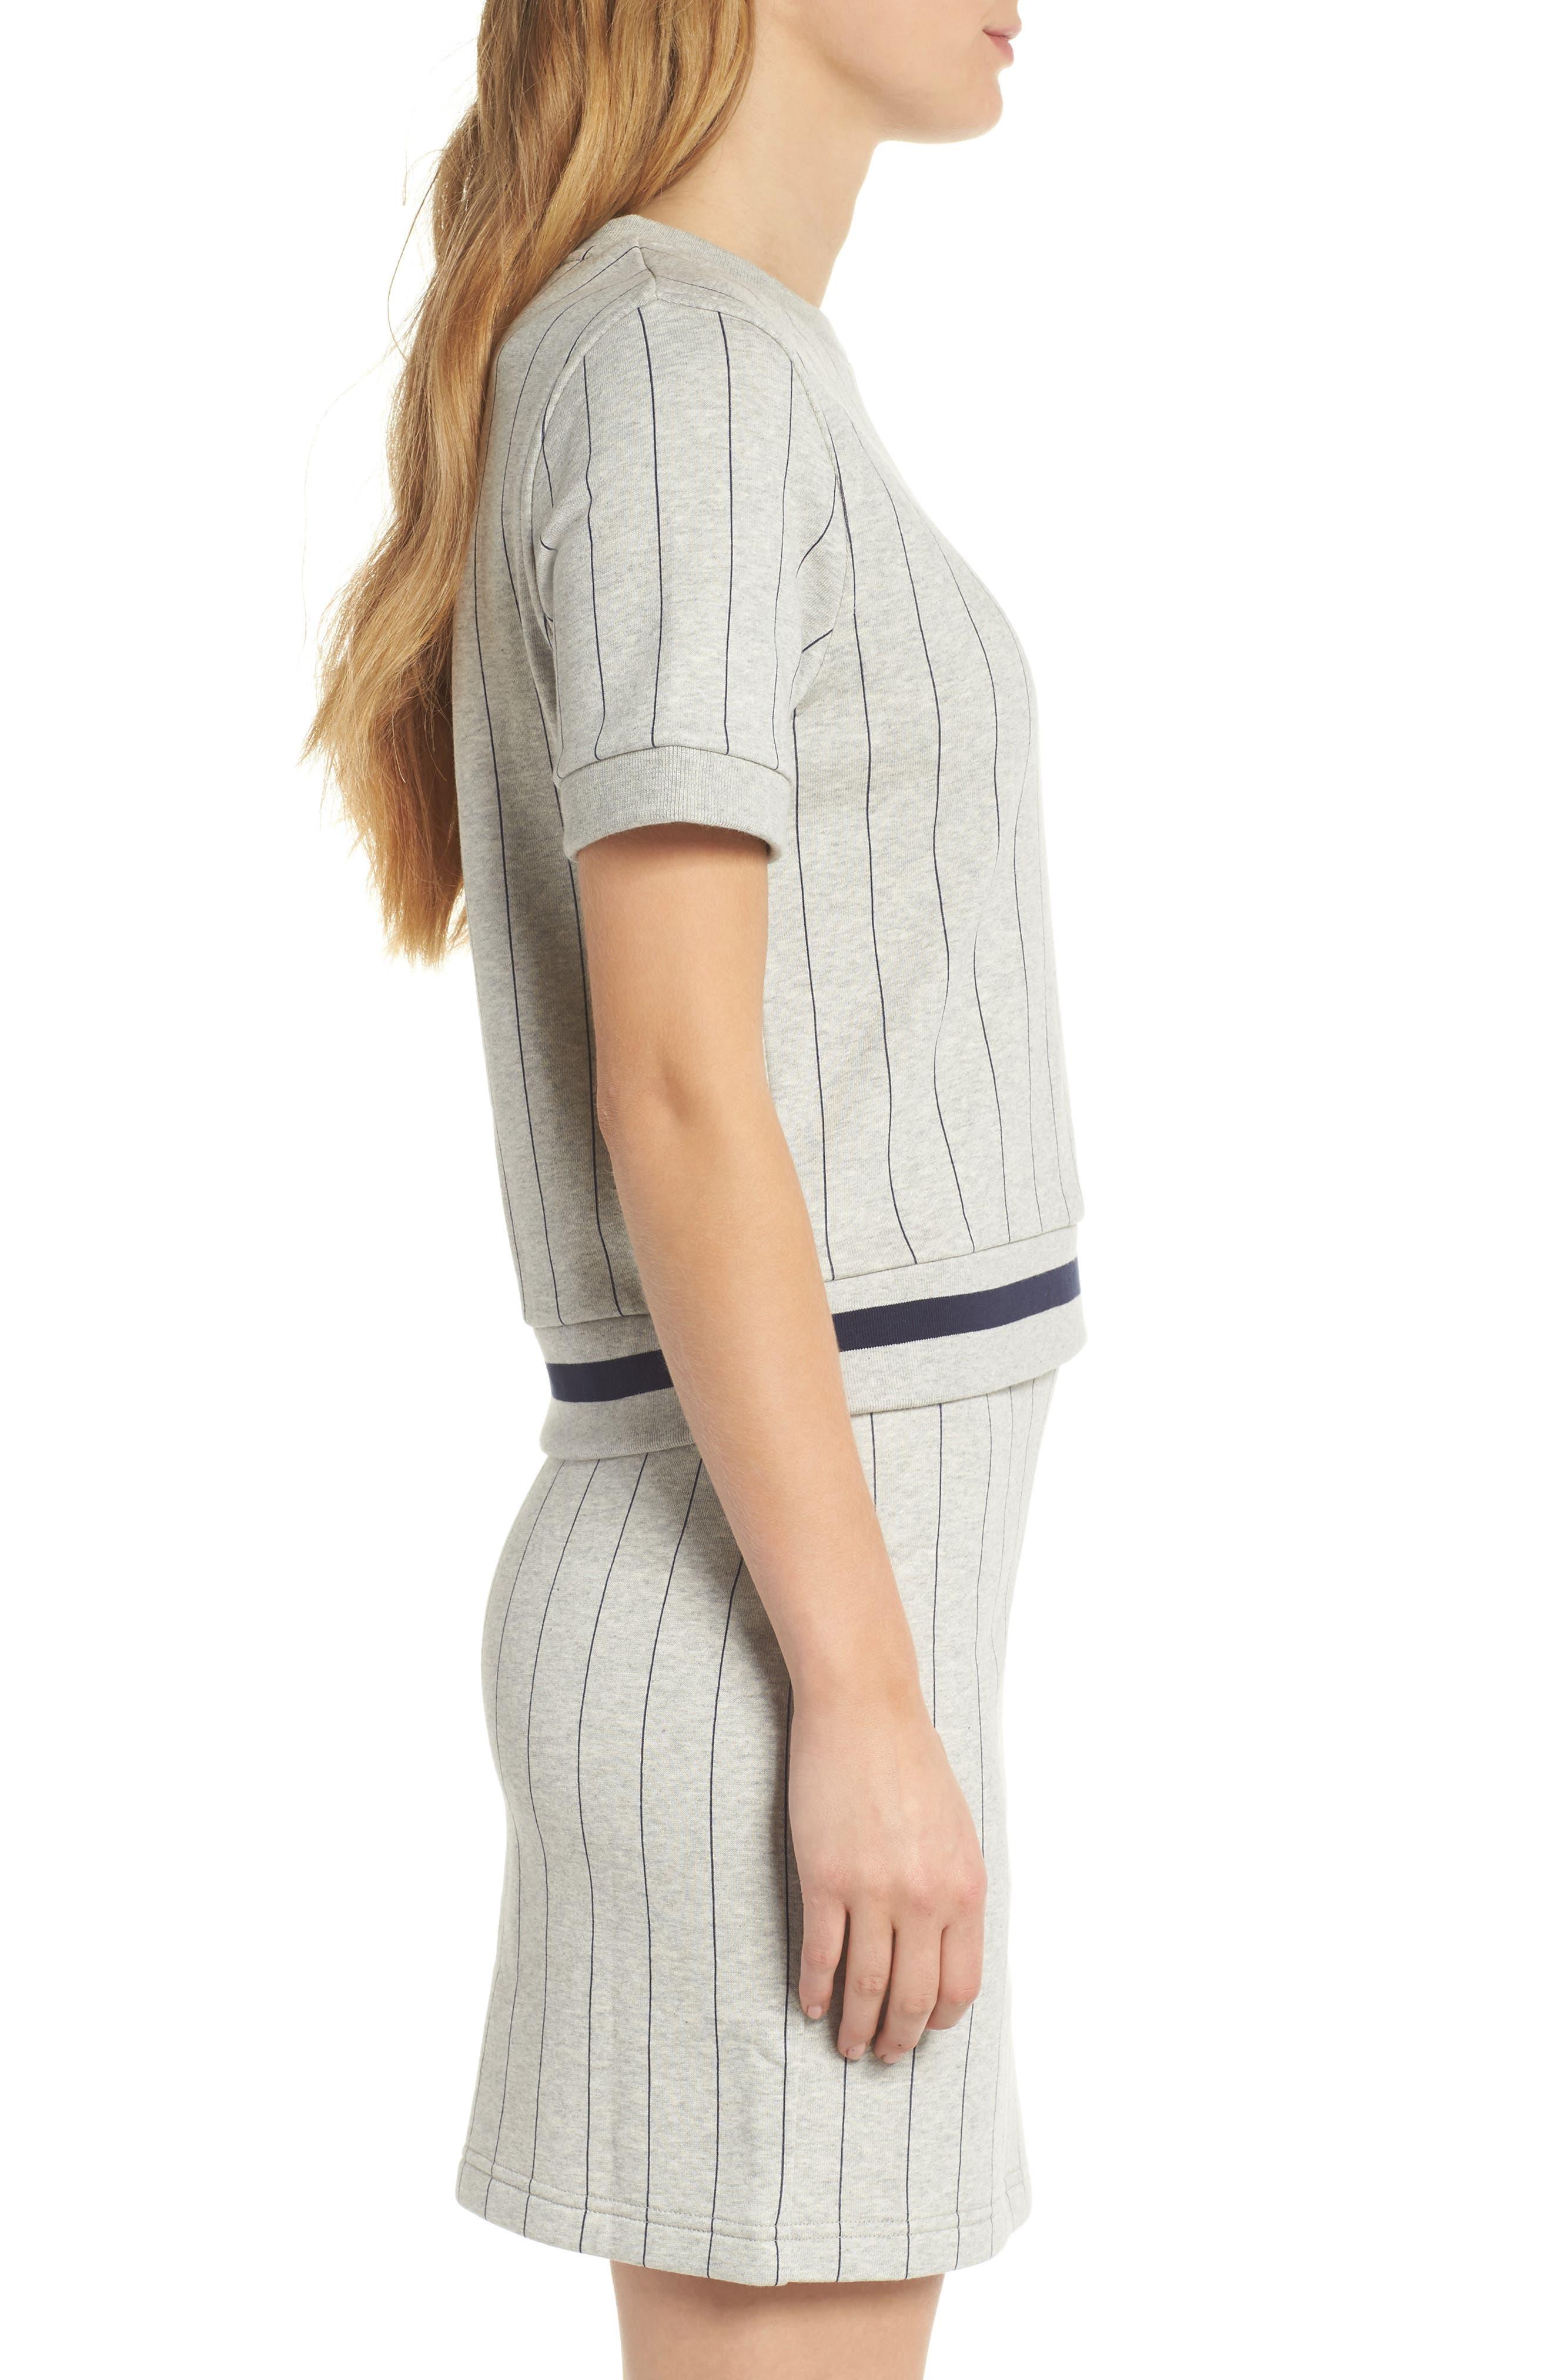 Bren Stripe Sweatshirt,                             Alternate thumbnail 4, color,                             Light Grey Marl/ Peacoat